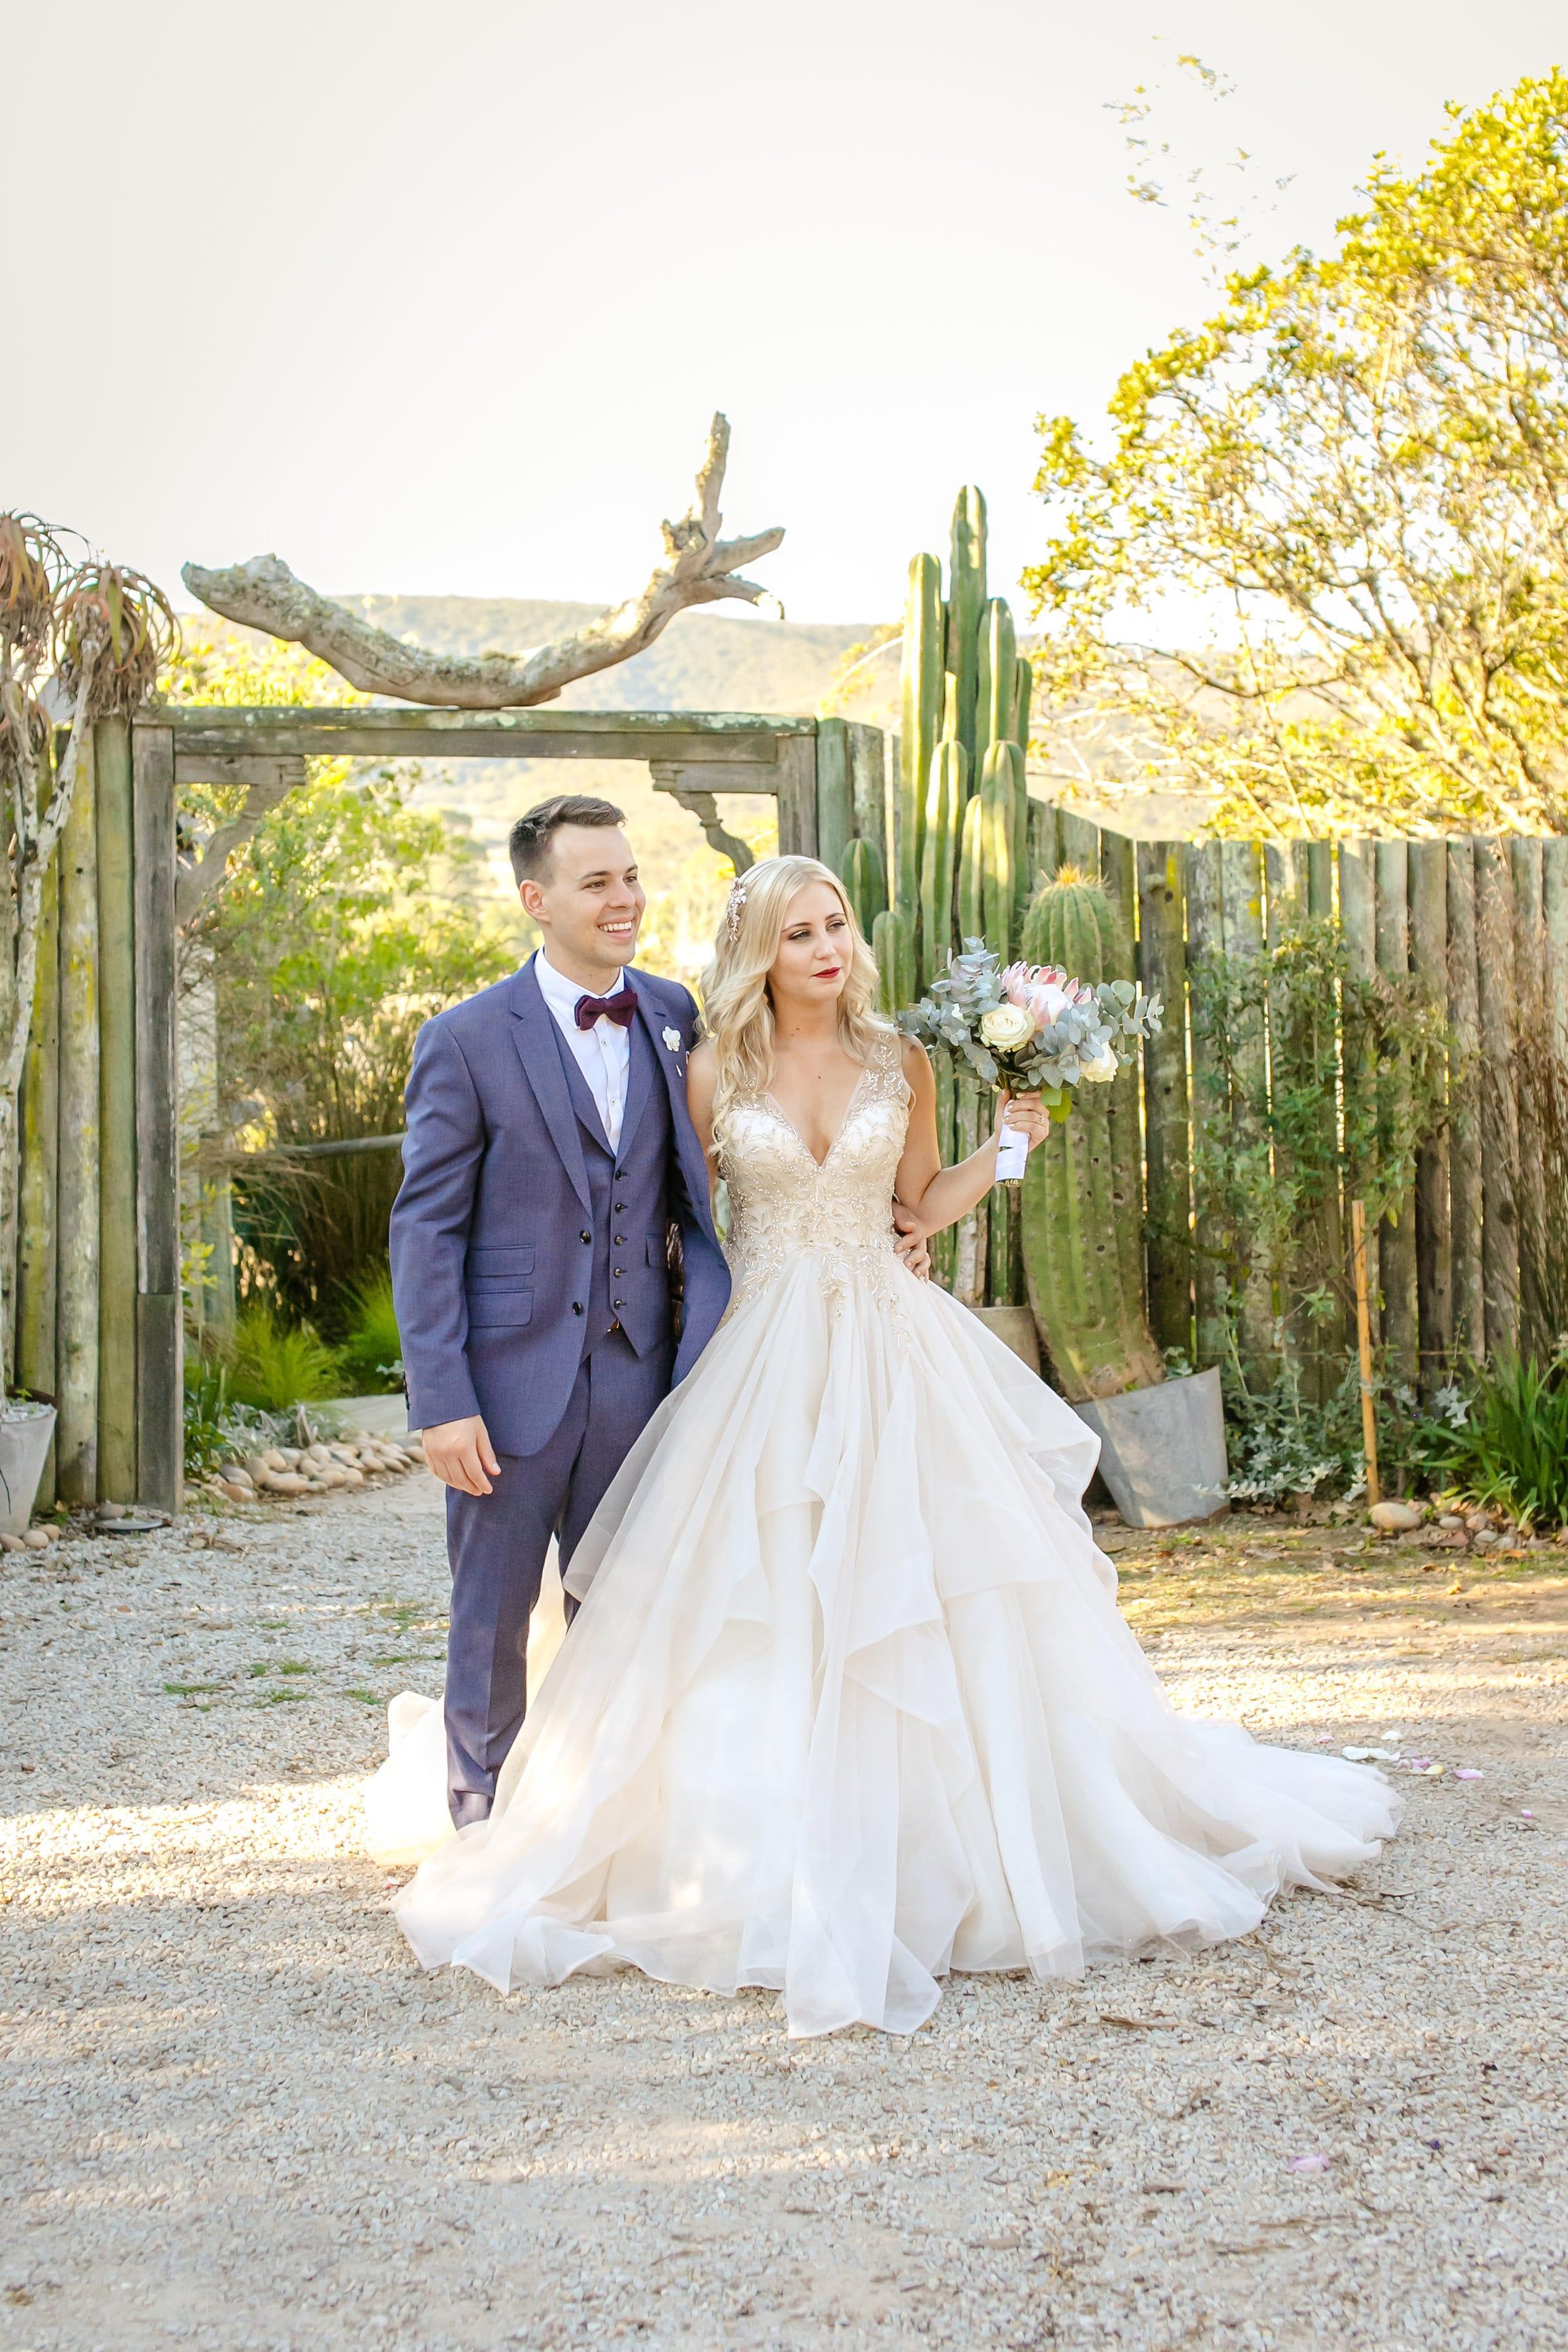 Chic Princess Wedding Dress in Elegant Australia Wedding - #MidgleyBride wearing Amélie by Sottero and Midgley